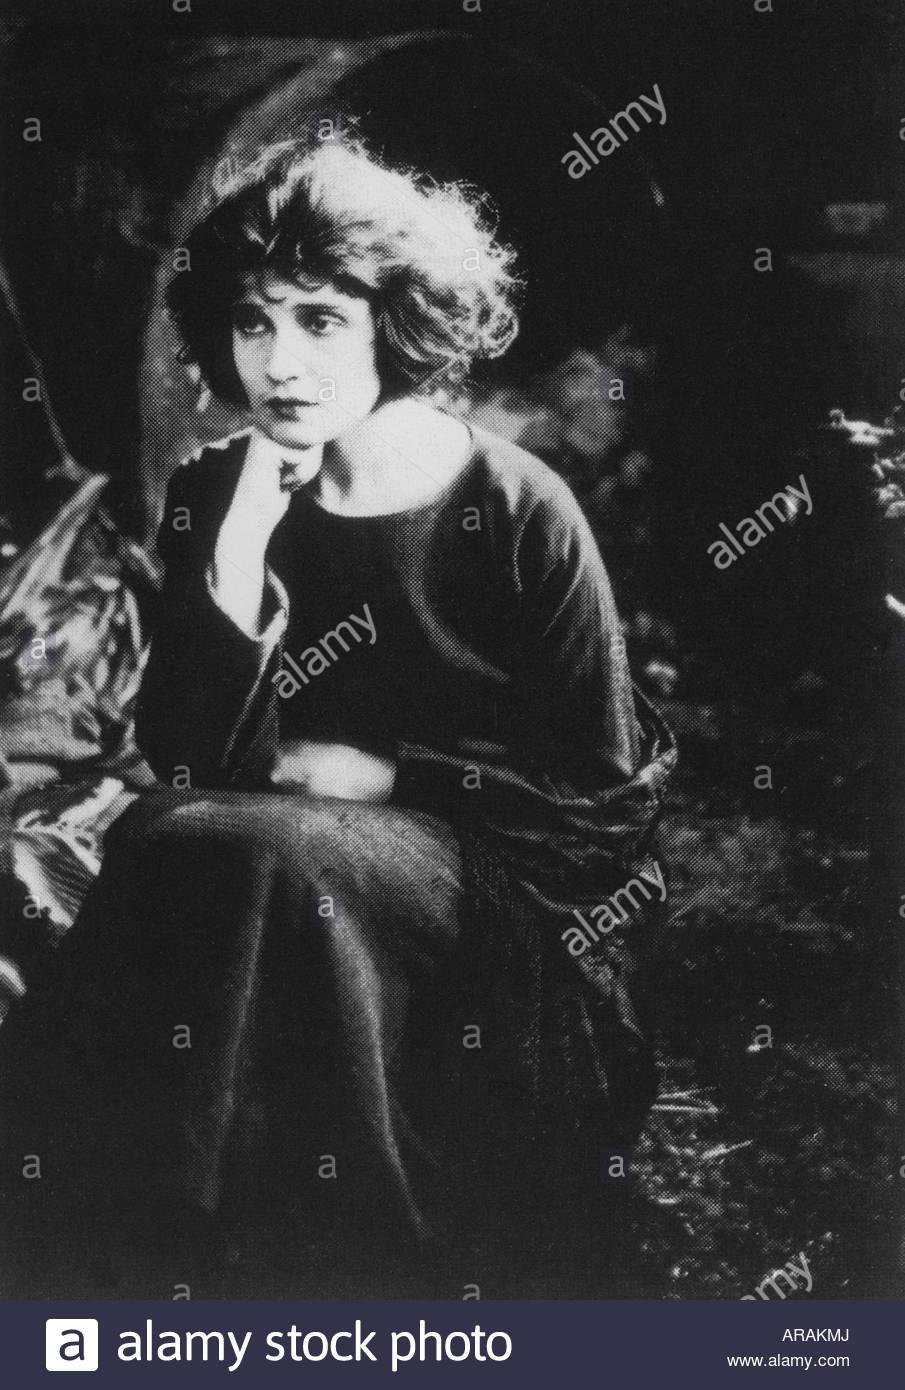 Modotti, Tina, 16.8.1896 - 5.1.1942, Italian Mexican photographer, half length, scene from a silent movie, 1919, - Stock Image